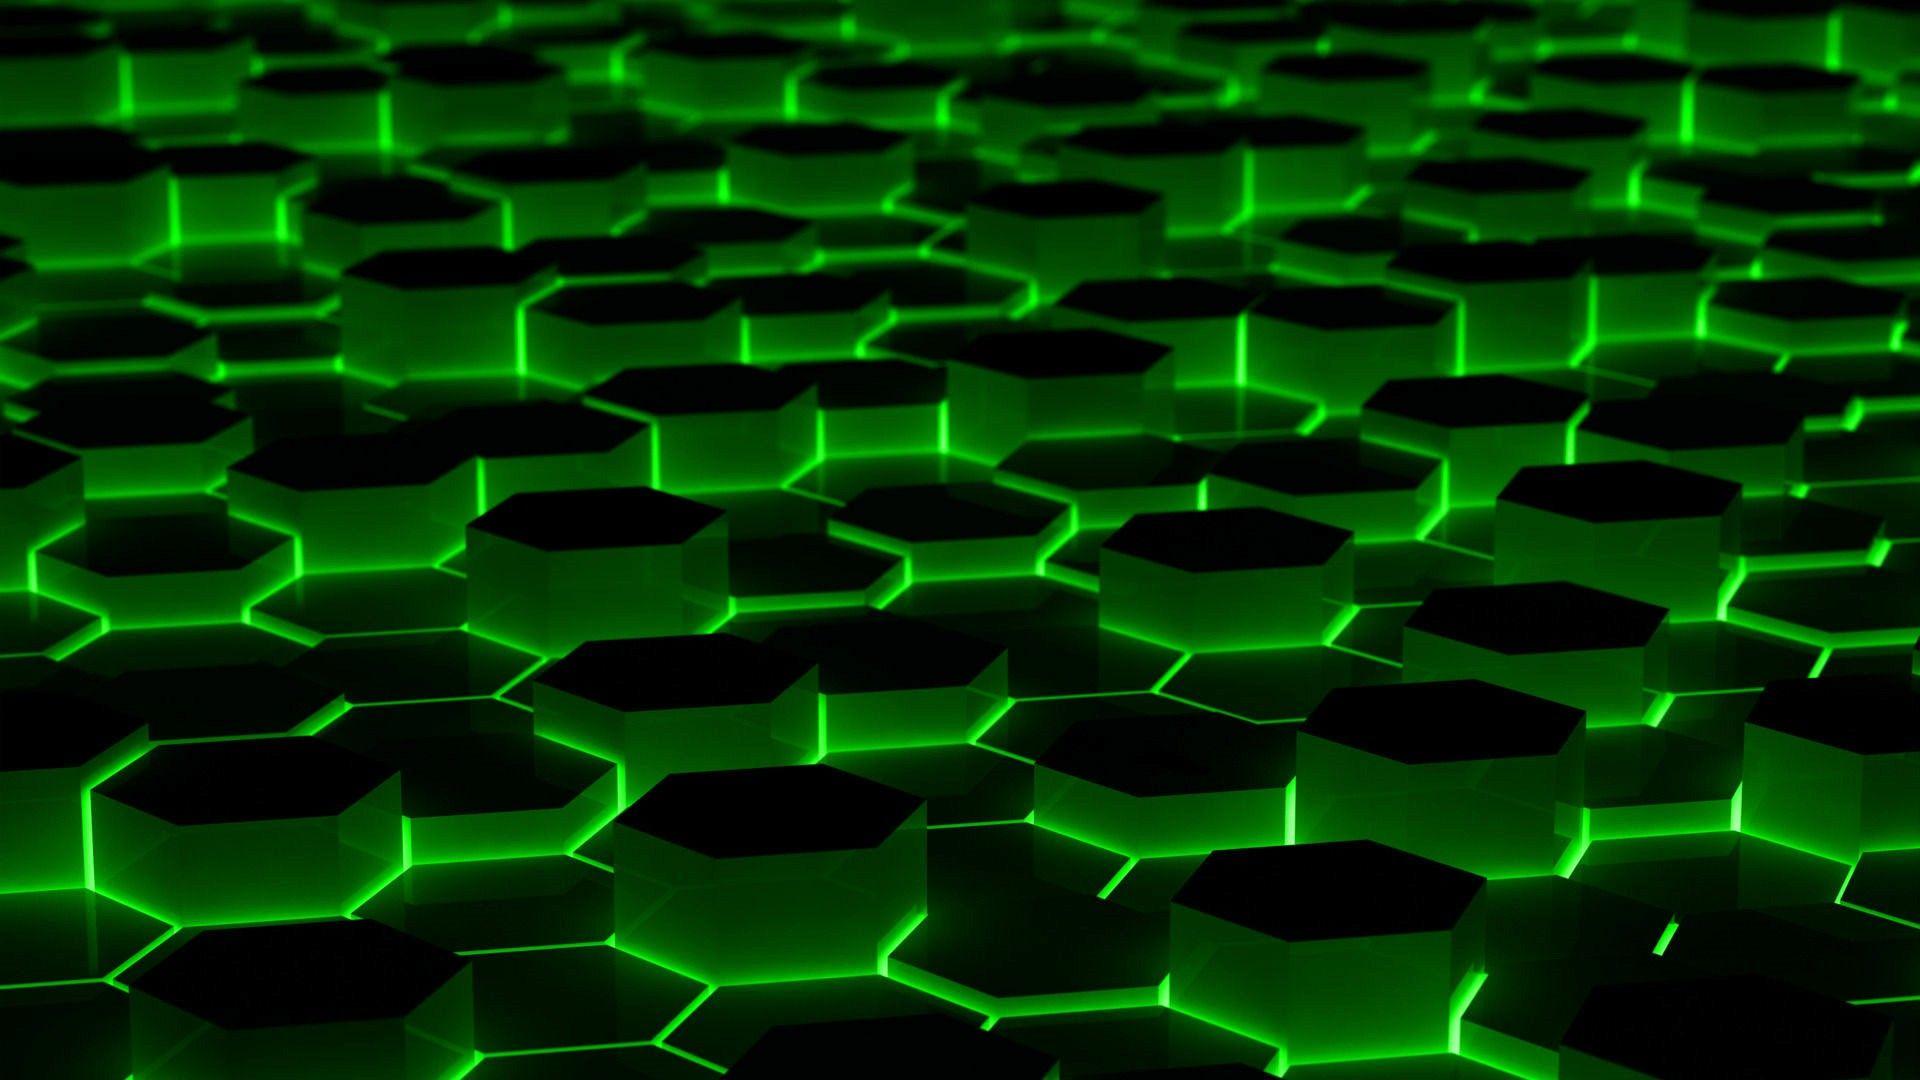 Best Neon Green Wallpaper Best Wallpaper Hd Neon Wallpaper Cool Wallpaper Cool Desktop Wallpapers